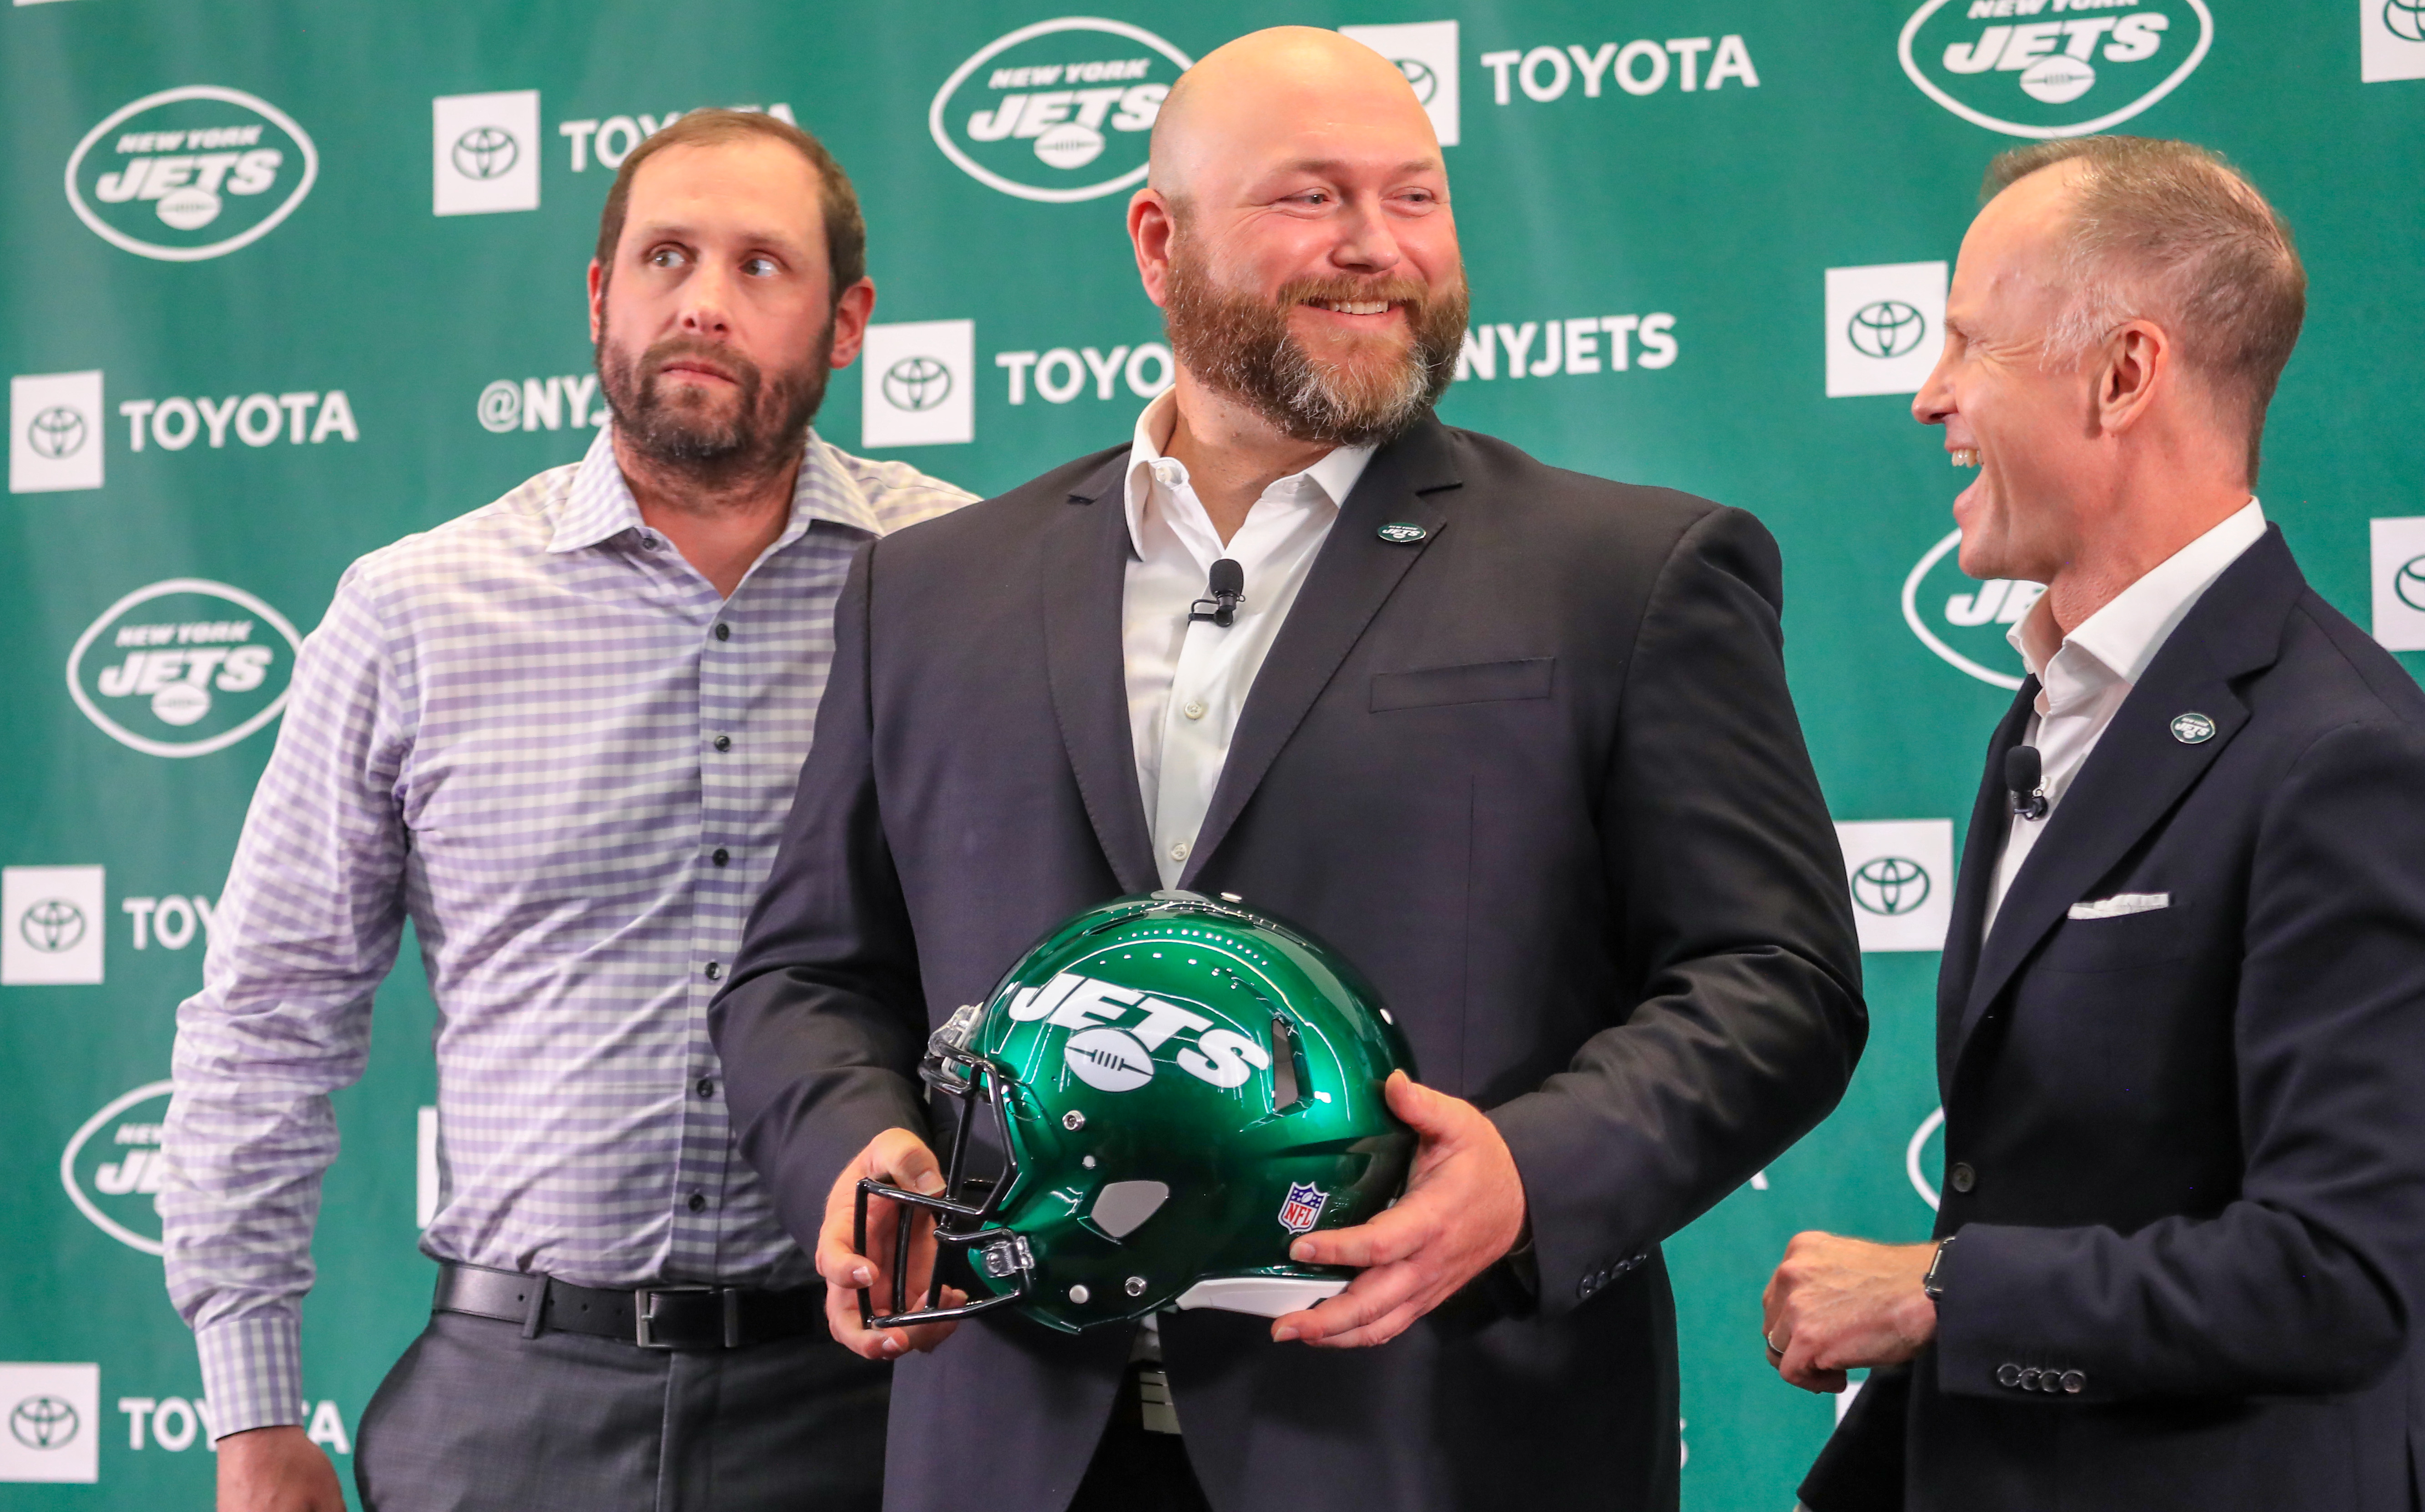 Latest 2019 NFL head coach power rankings, pre-training camp: Where are Giants' Pat Shurmur, Jets' Adam Gase, Eagles' Doug Pederson, Cowboys' Jason Garrett?